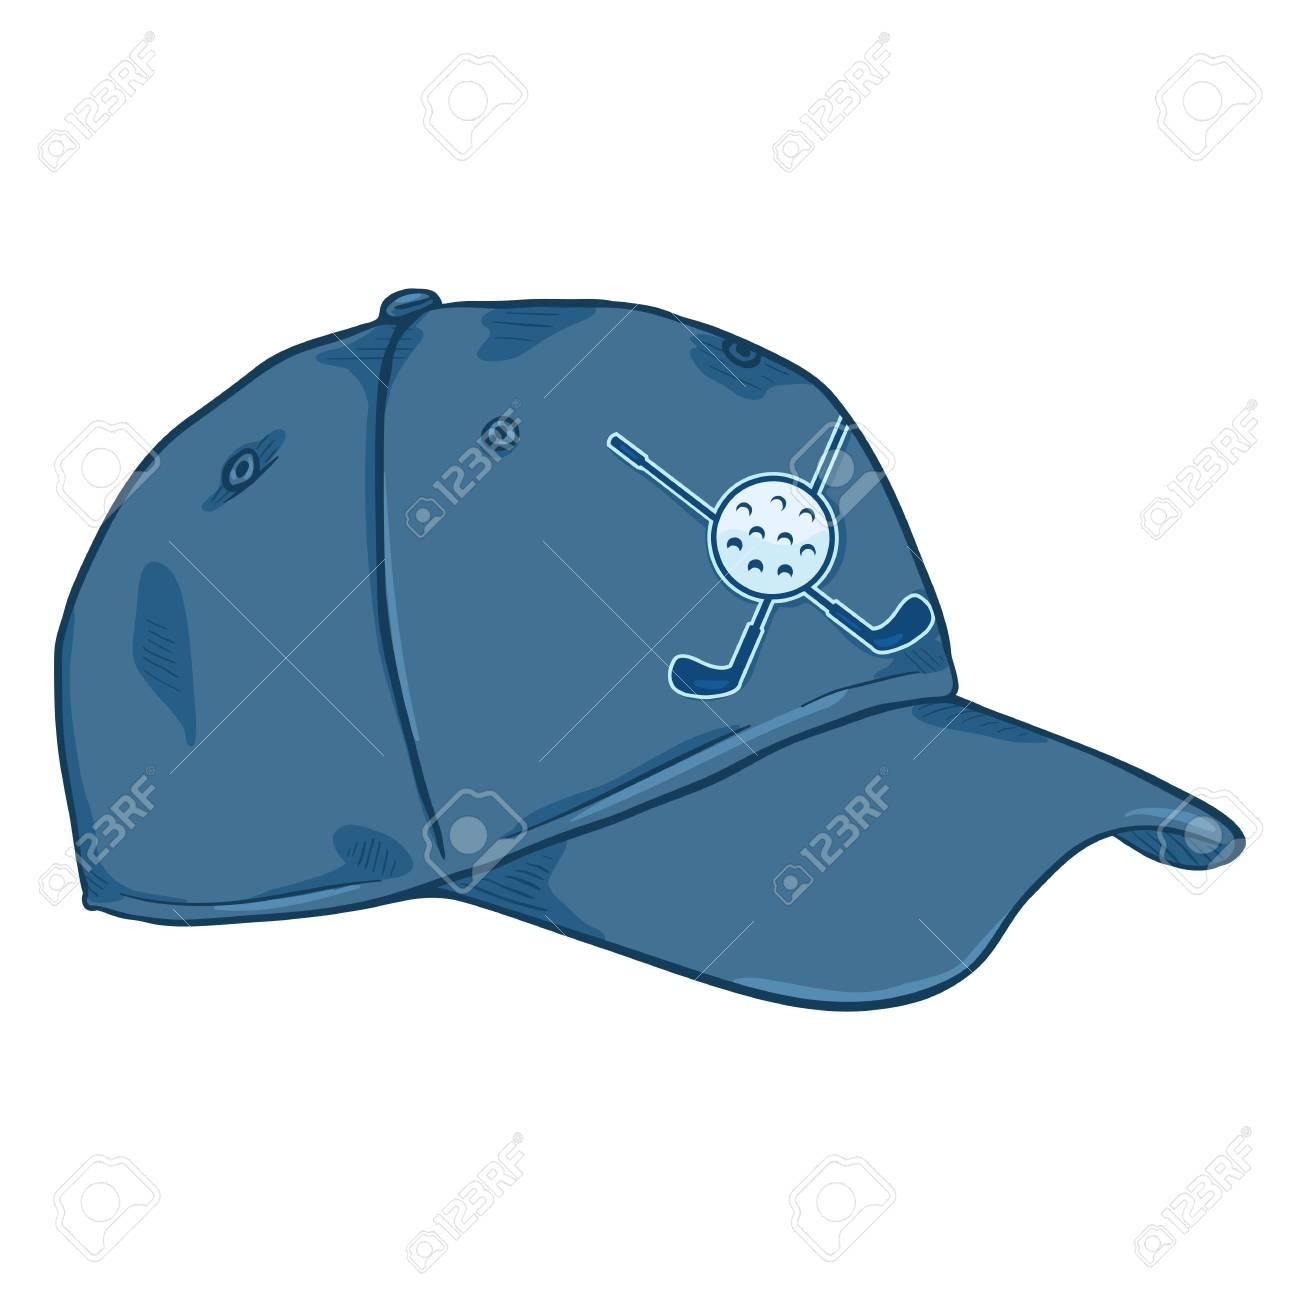 vector cartoon classic blue baseball cap with golf logo royalty free rh 123rf com baseball cap vector png baseball cap vector free